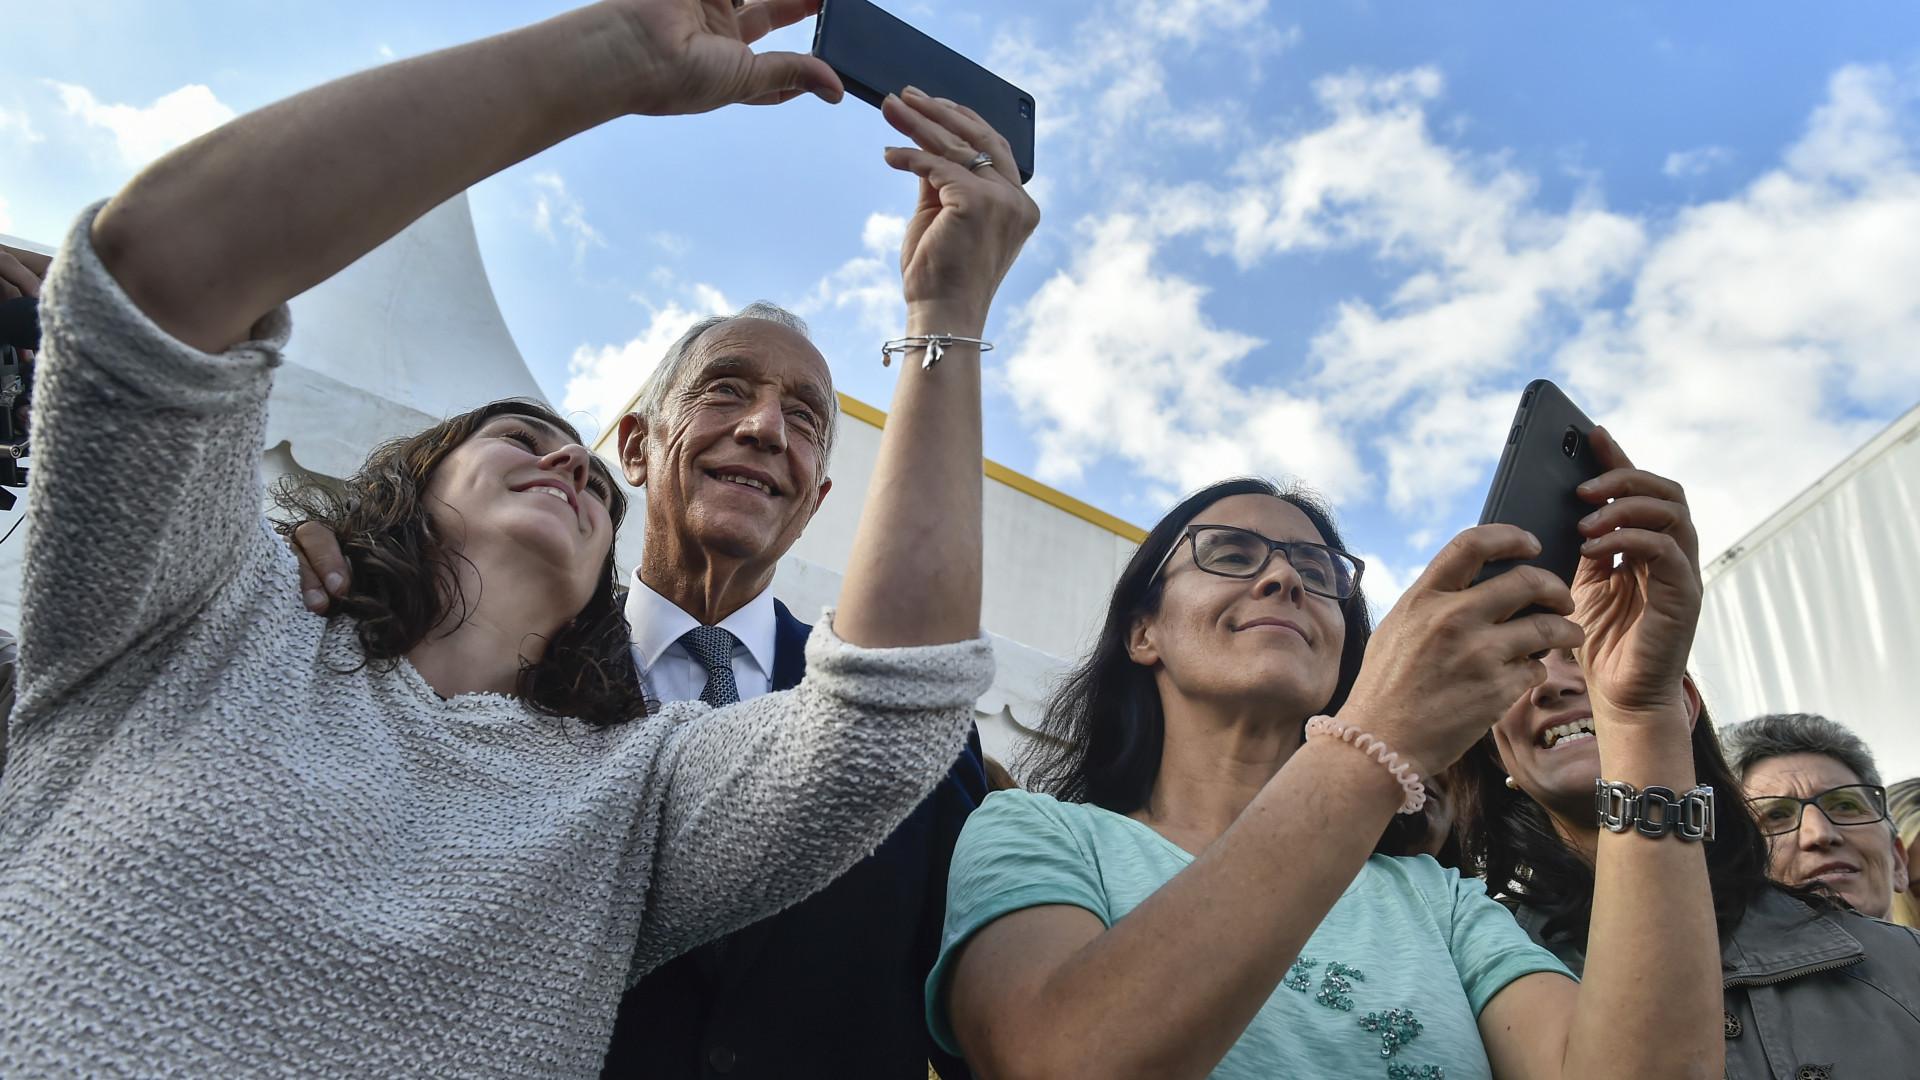 Marcelo quer estratégia contra pobreza e diz que momento é agora